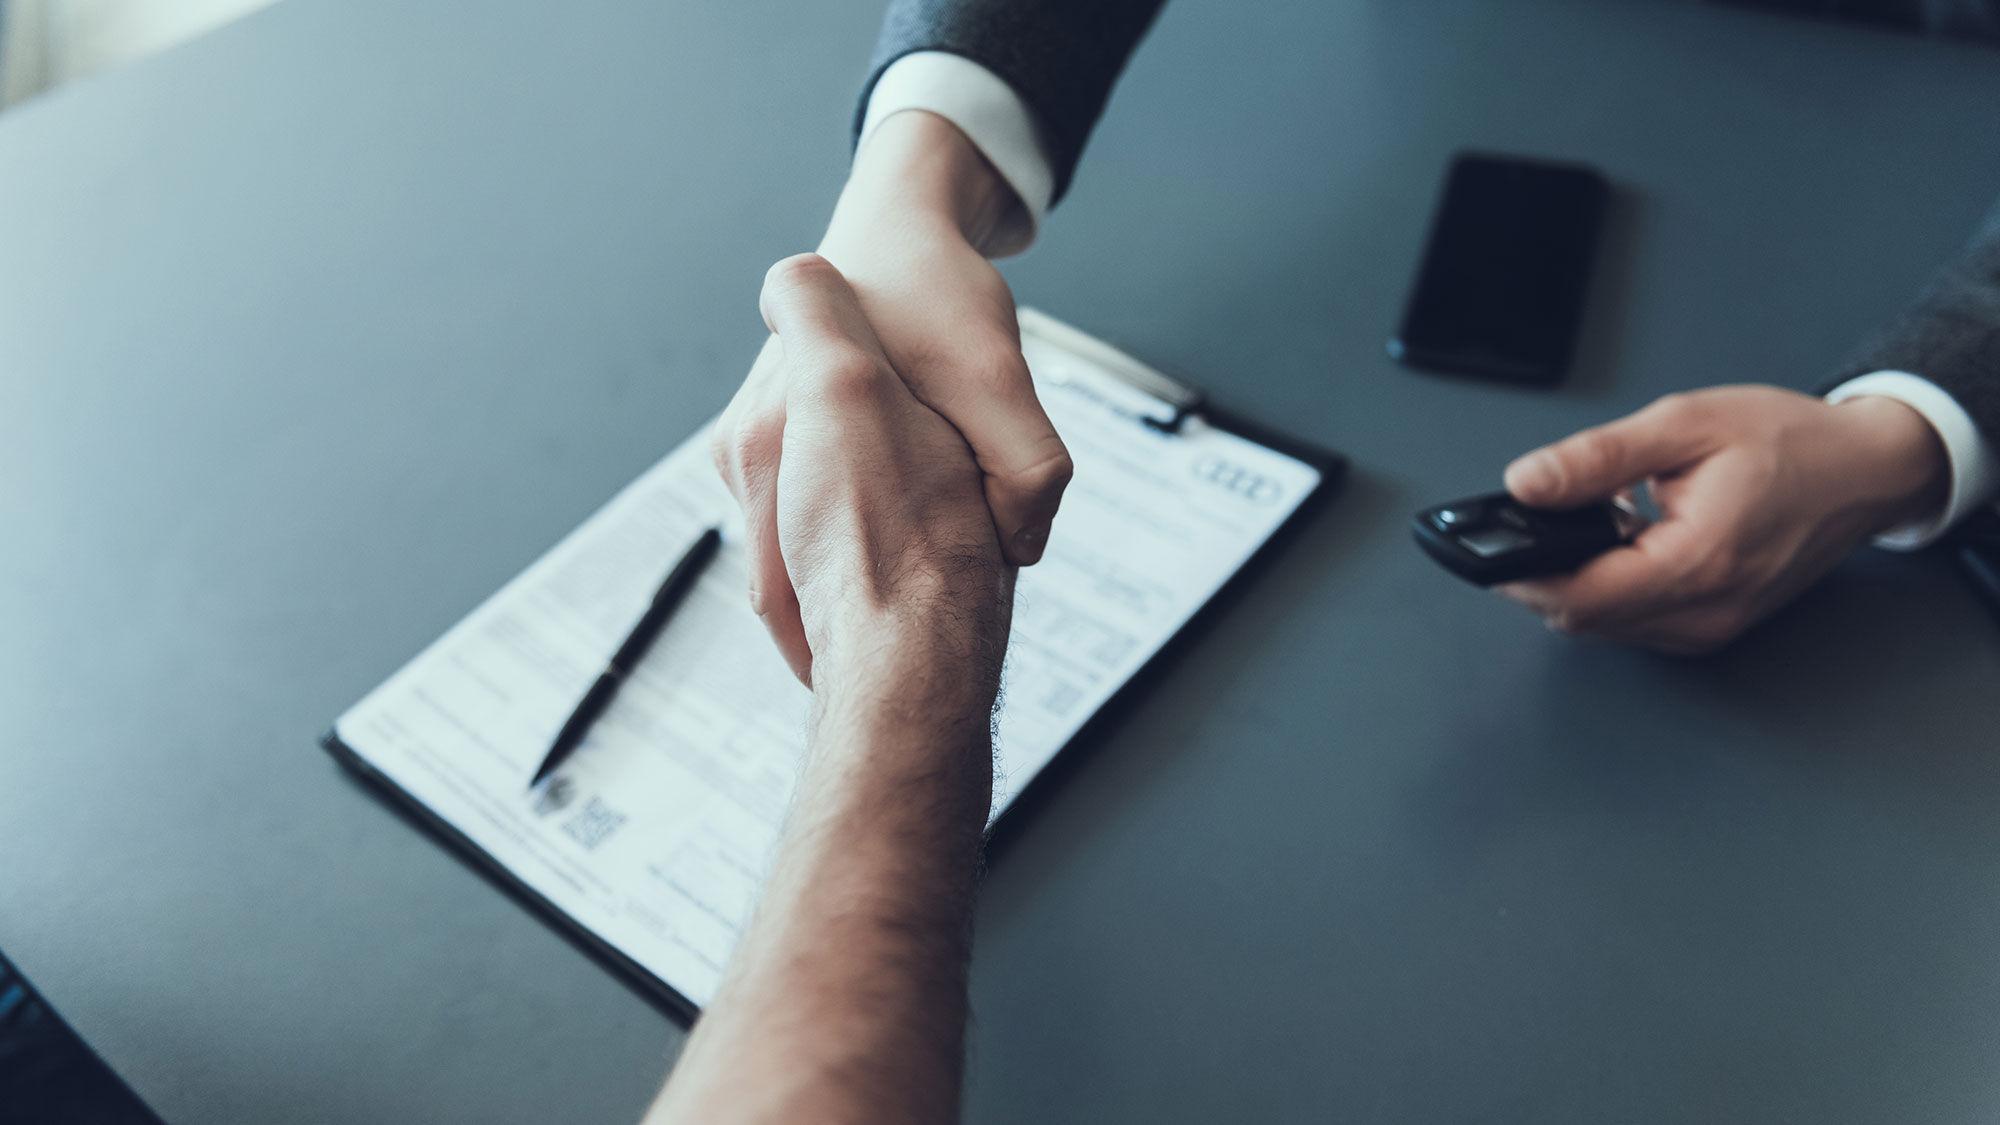 Business agreement handshake [Credit: VGstockstudio/Shutterstock.com]